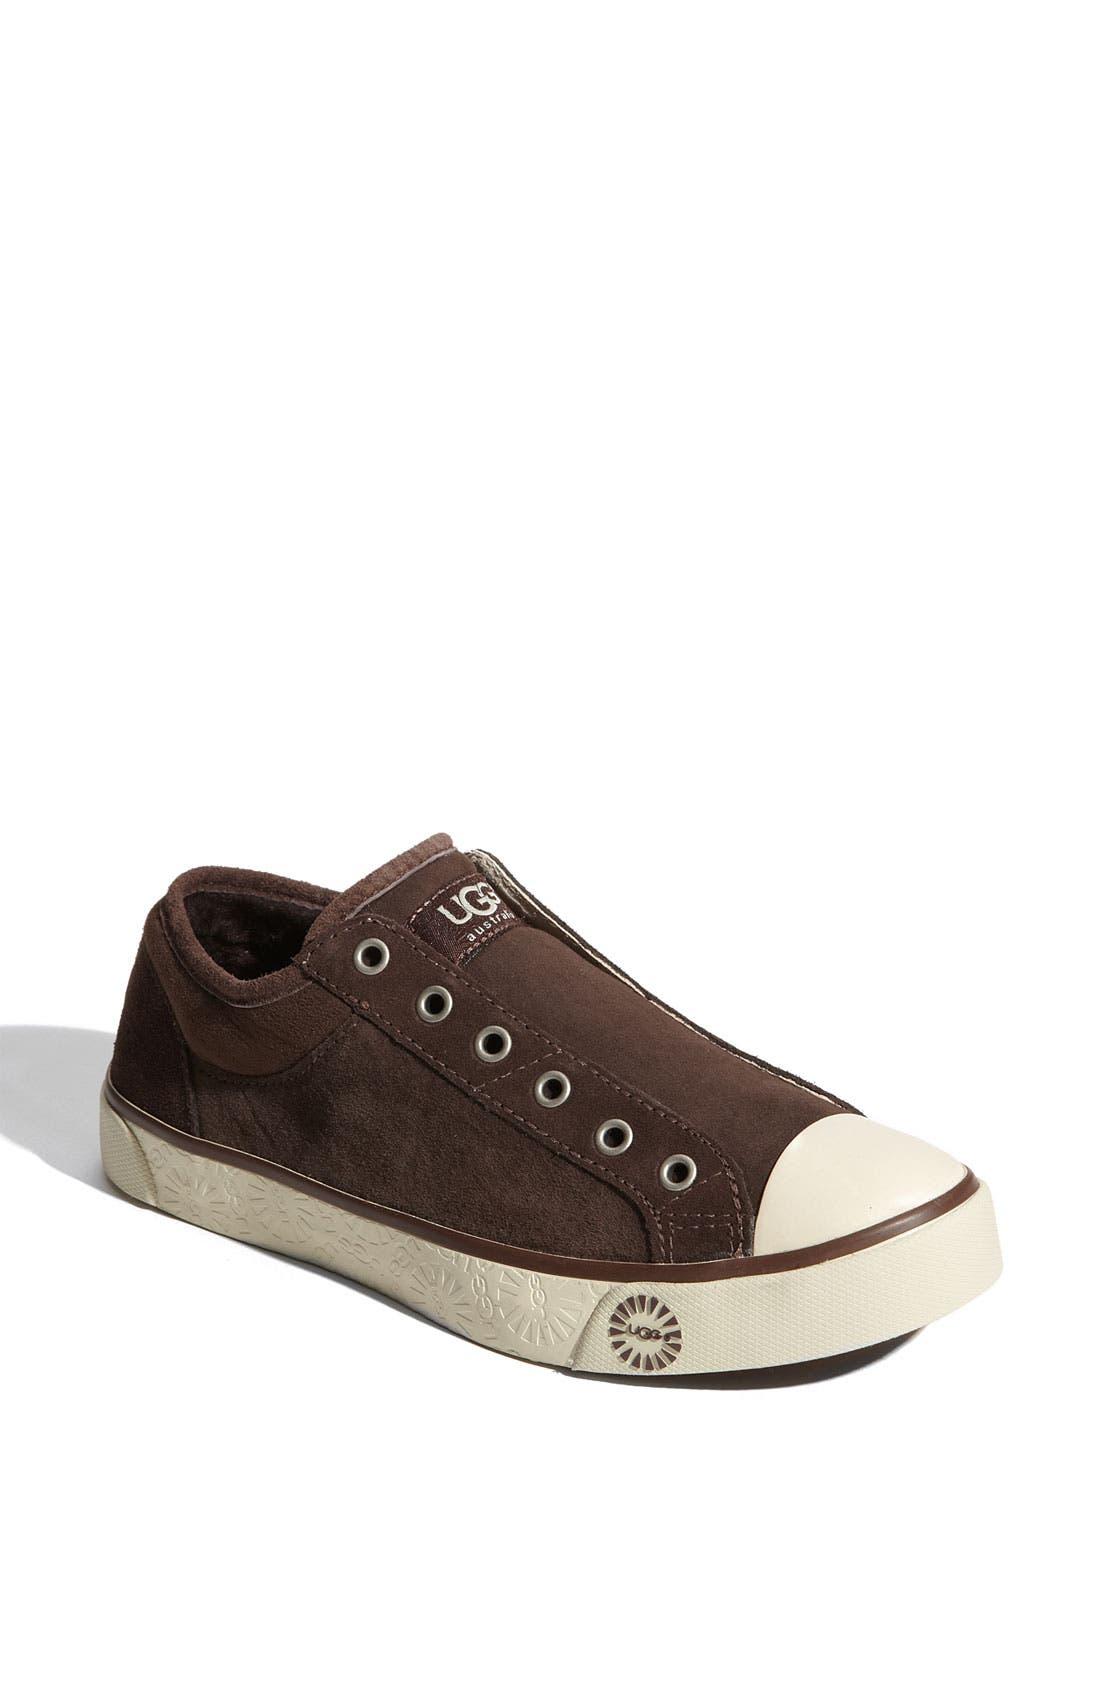 Main Image - UGG® Australia 'Laela' Sneaker (Women)